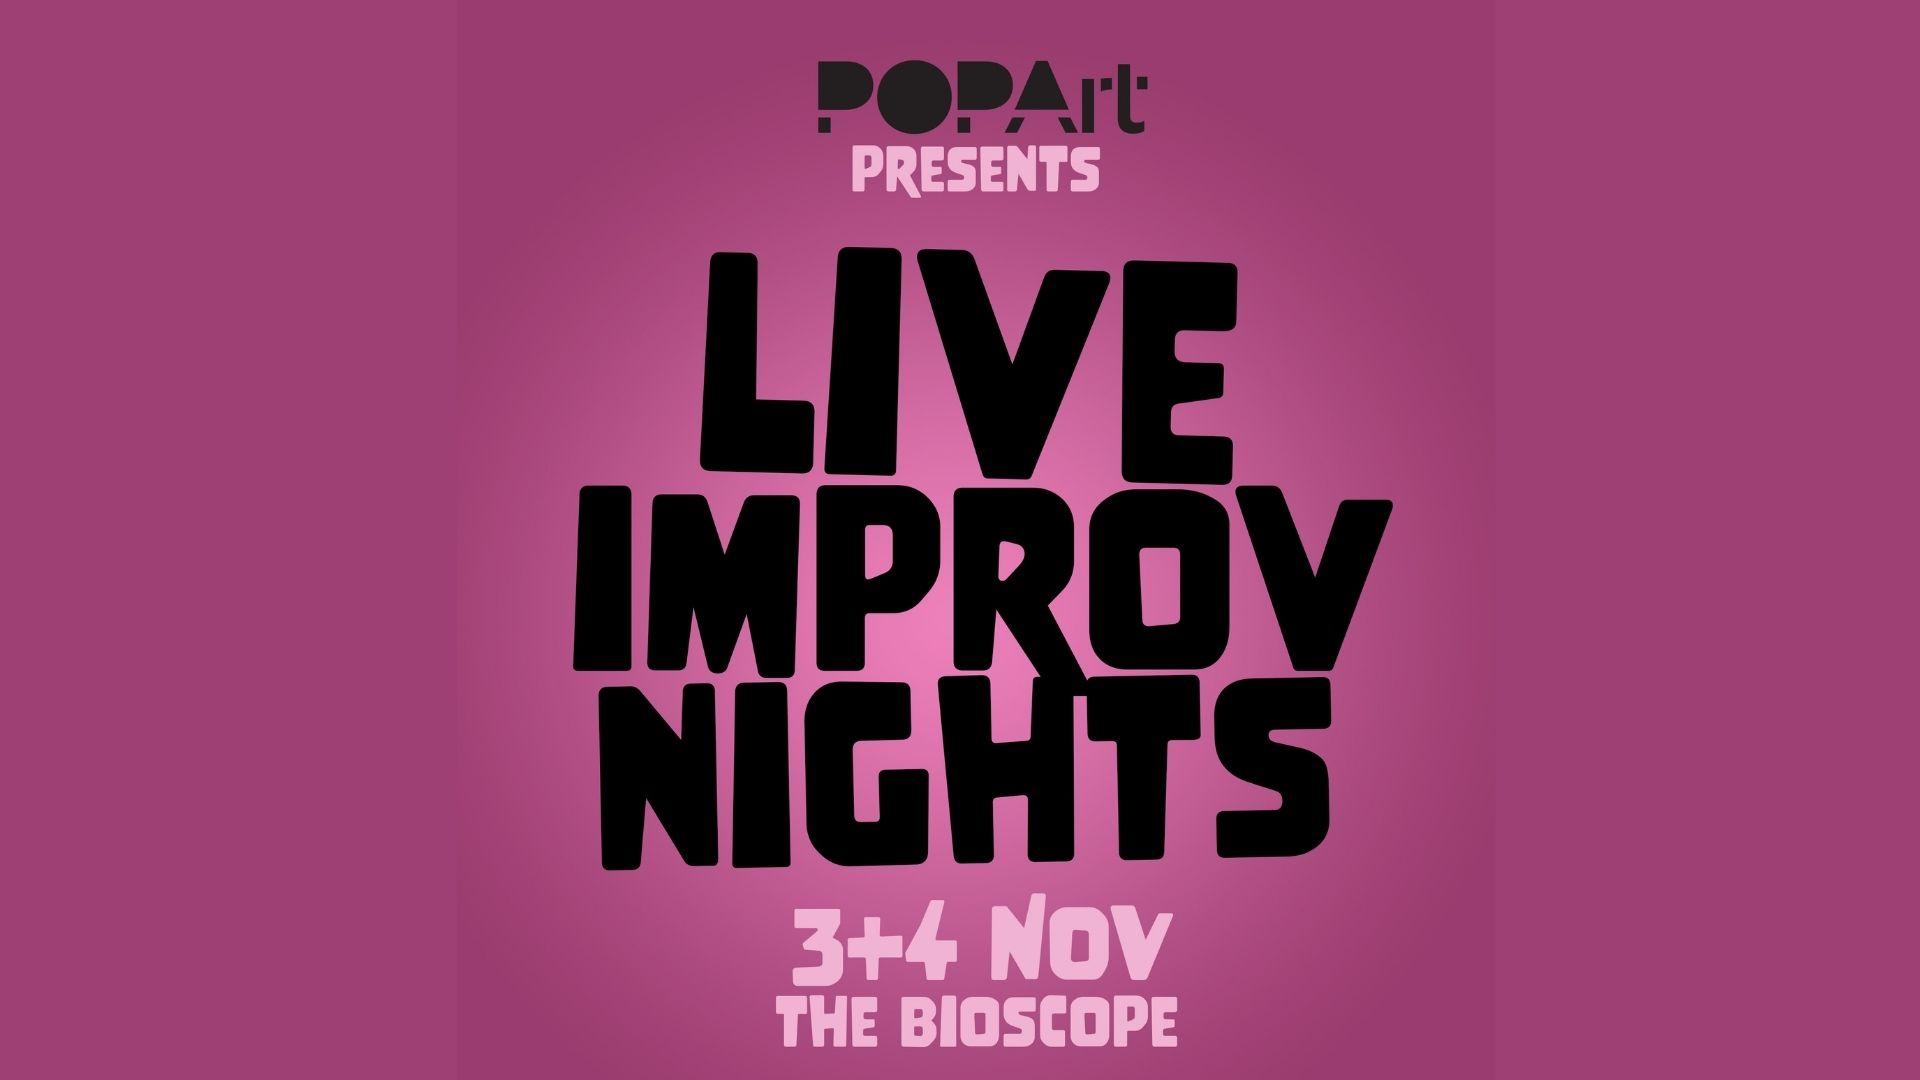 LIVE IMPROV NIGHTS AT THE BIOSCOPE